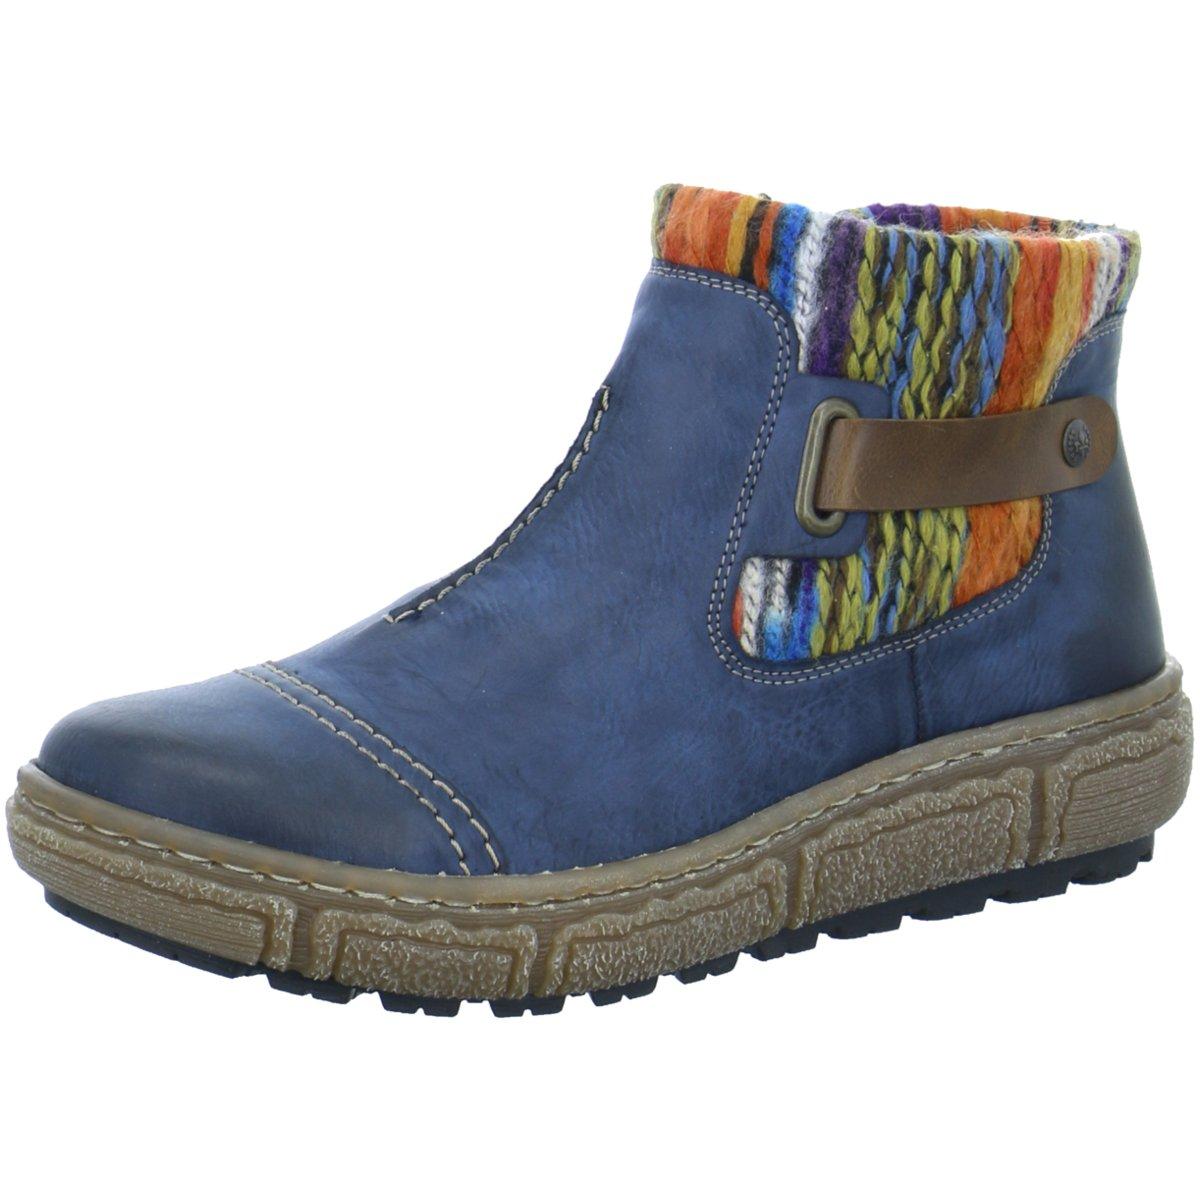 NEU Rieker Damen Komfort Z798414 blau 353104